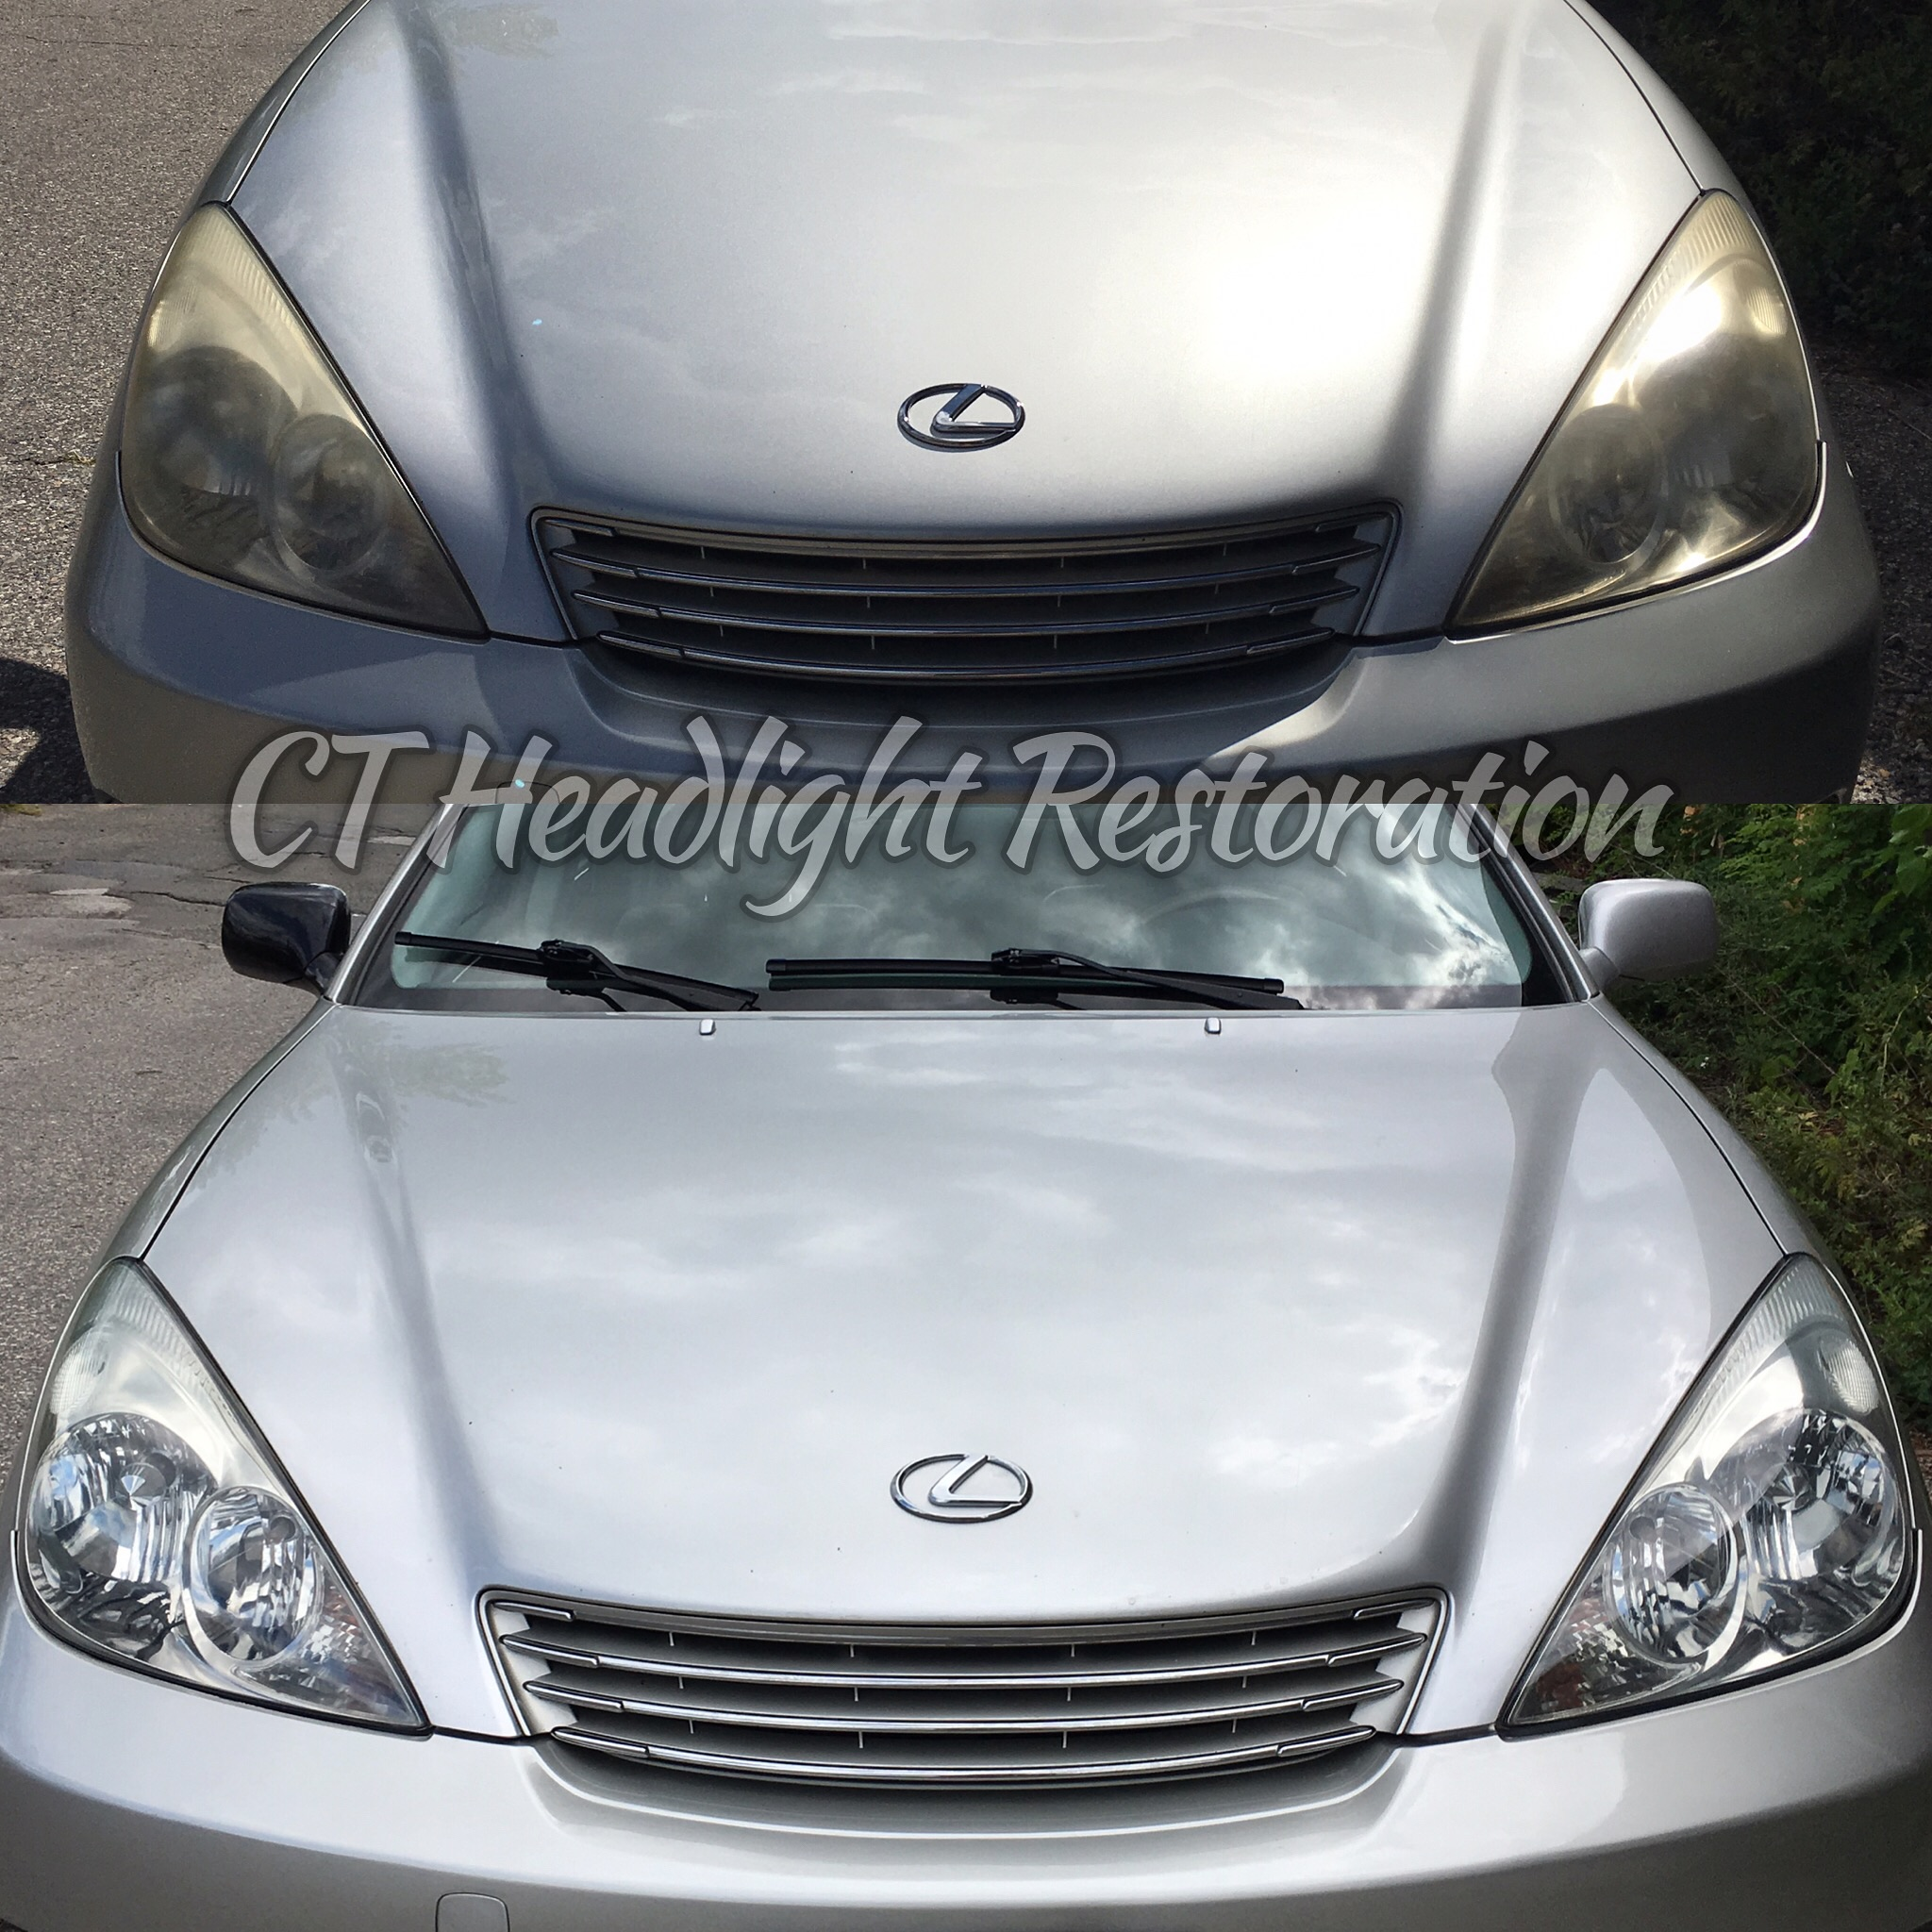 Lexus Es CT Headlight Restoration.jpg